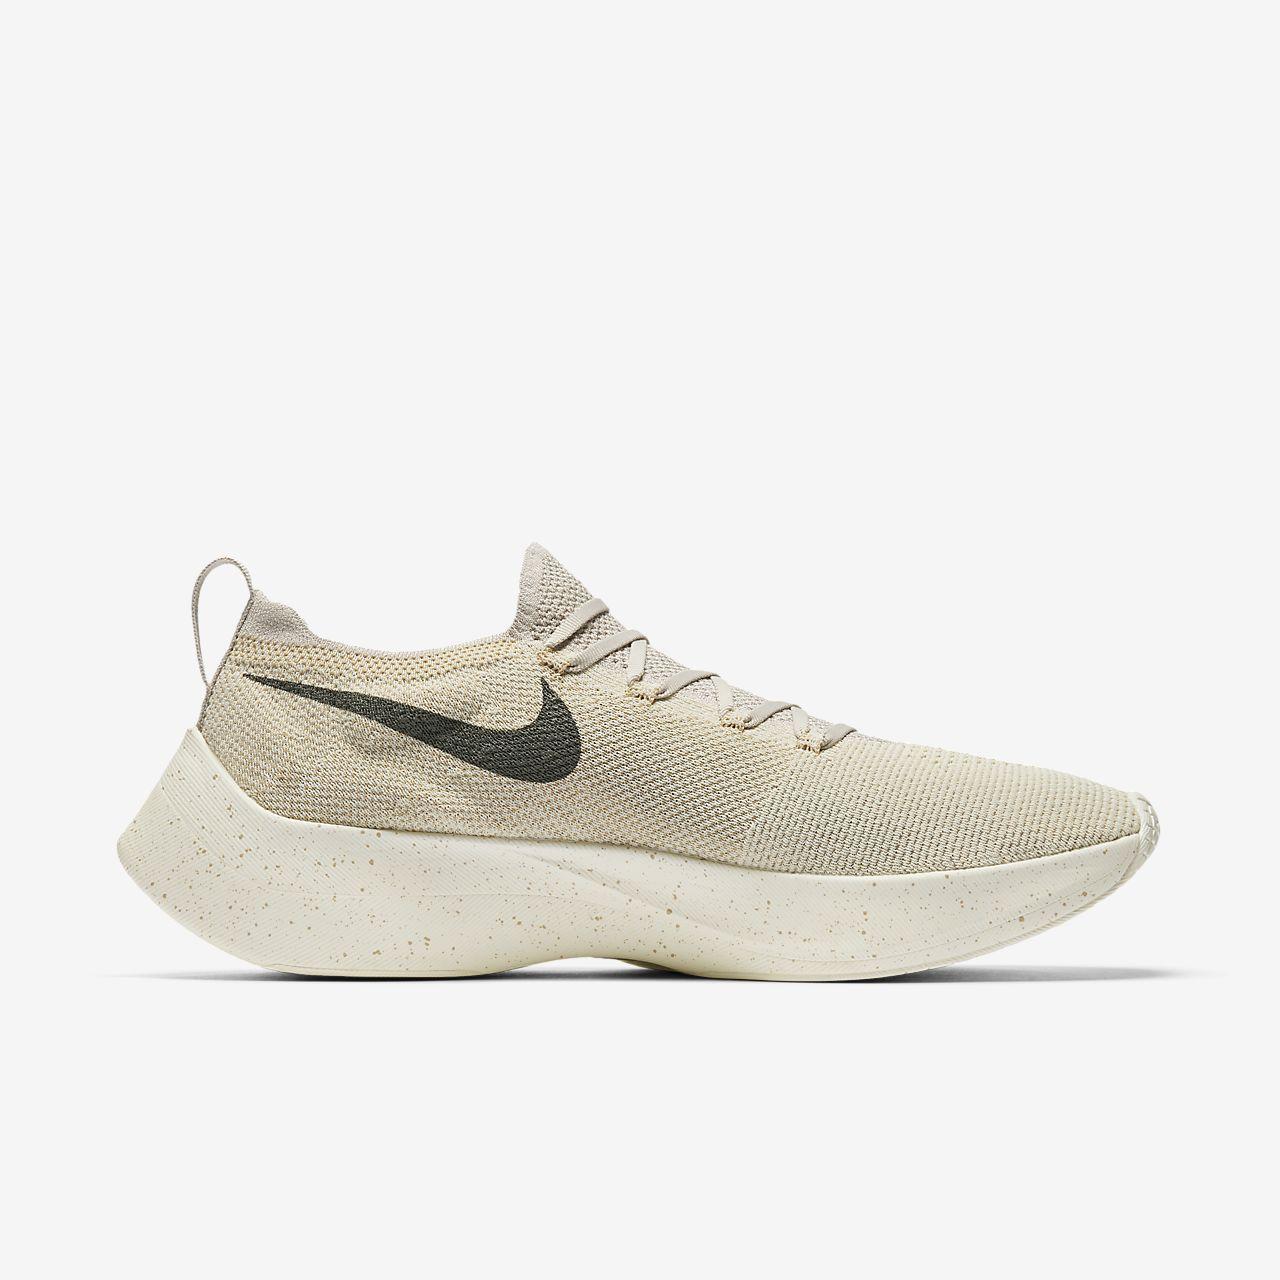 6d719ff12b5 Scarpa Nike React Vapor Street Flyknit - Uomo. Nike.com IT